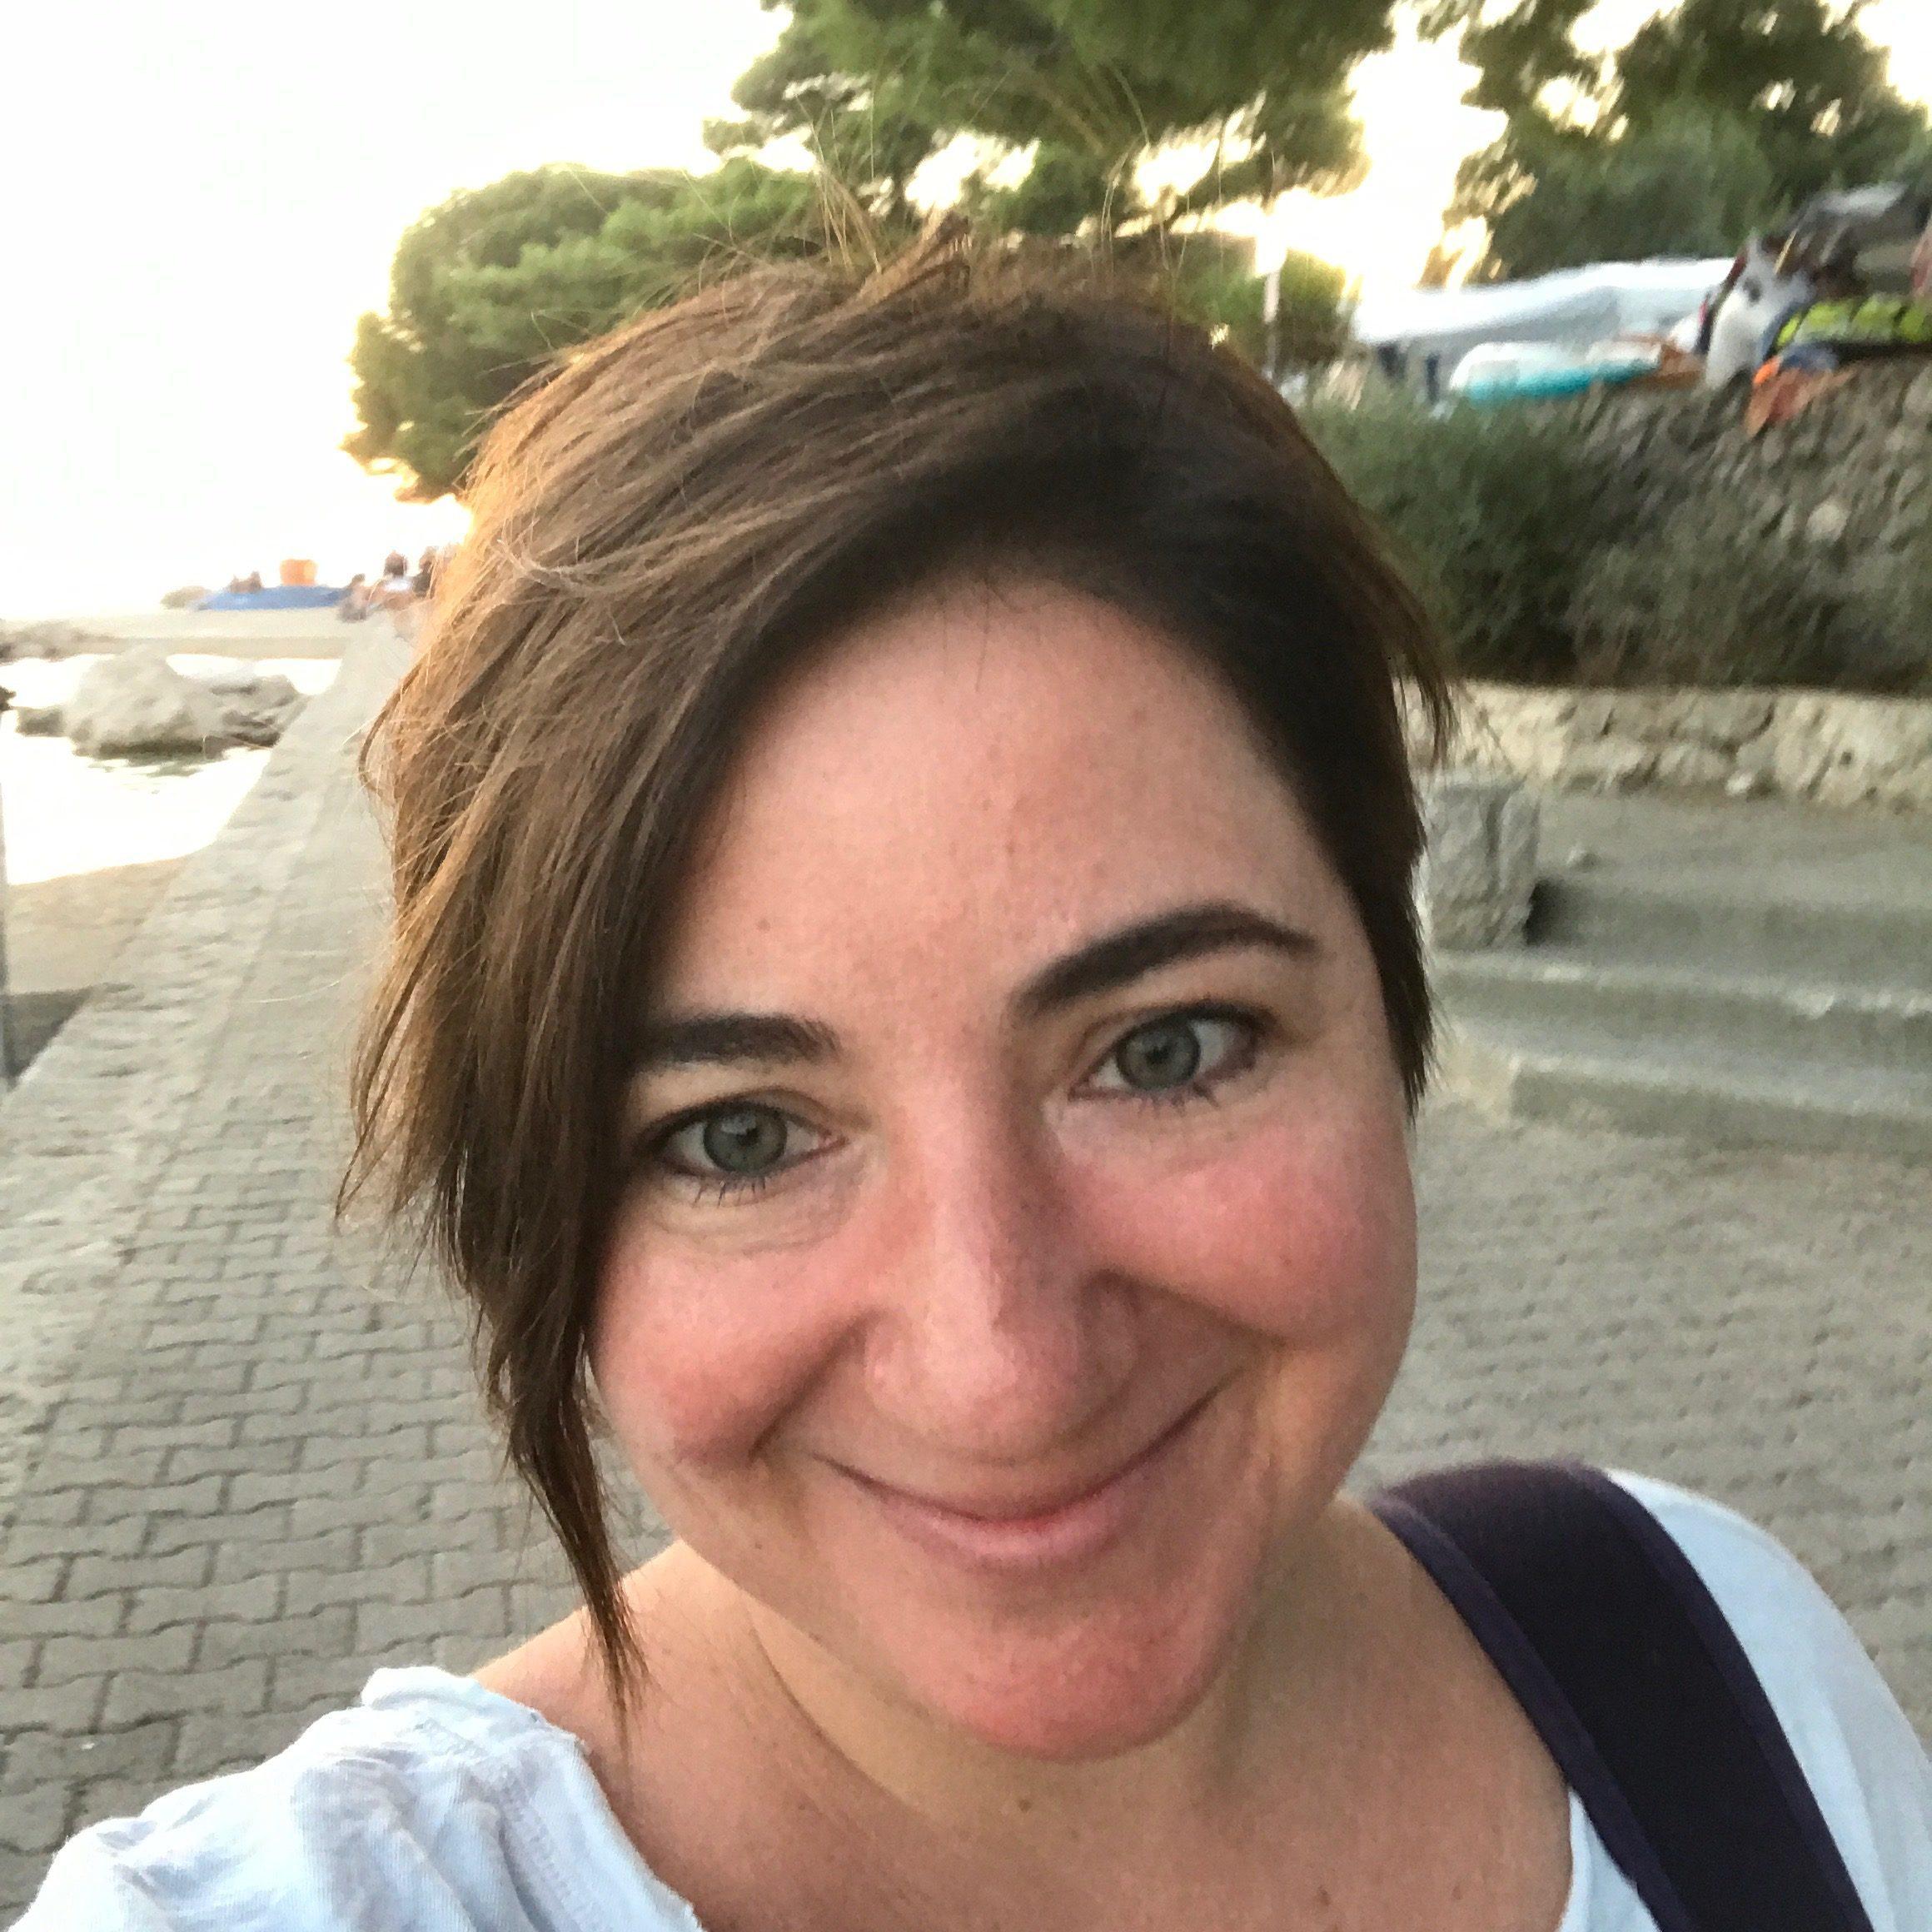 Chiara Cordoni